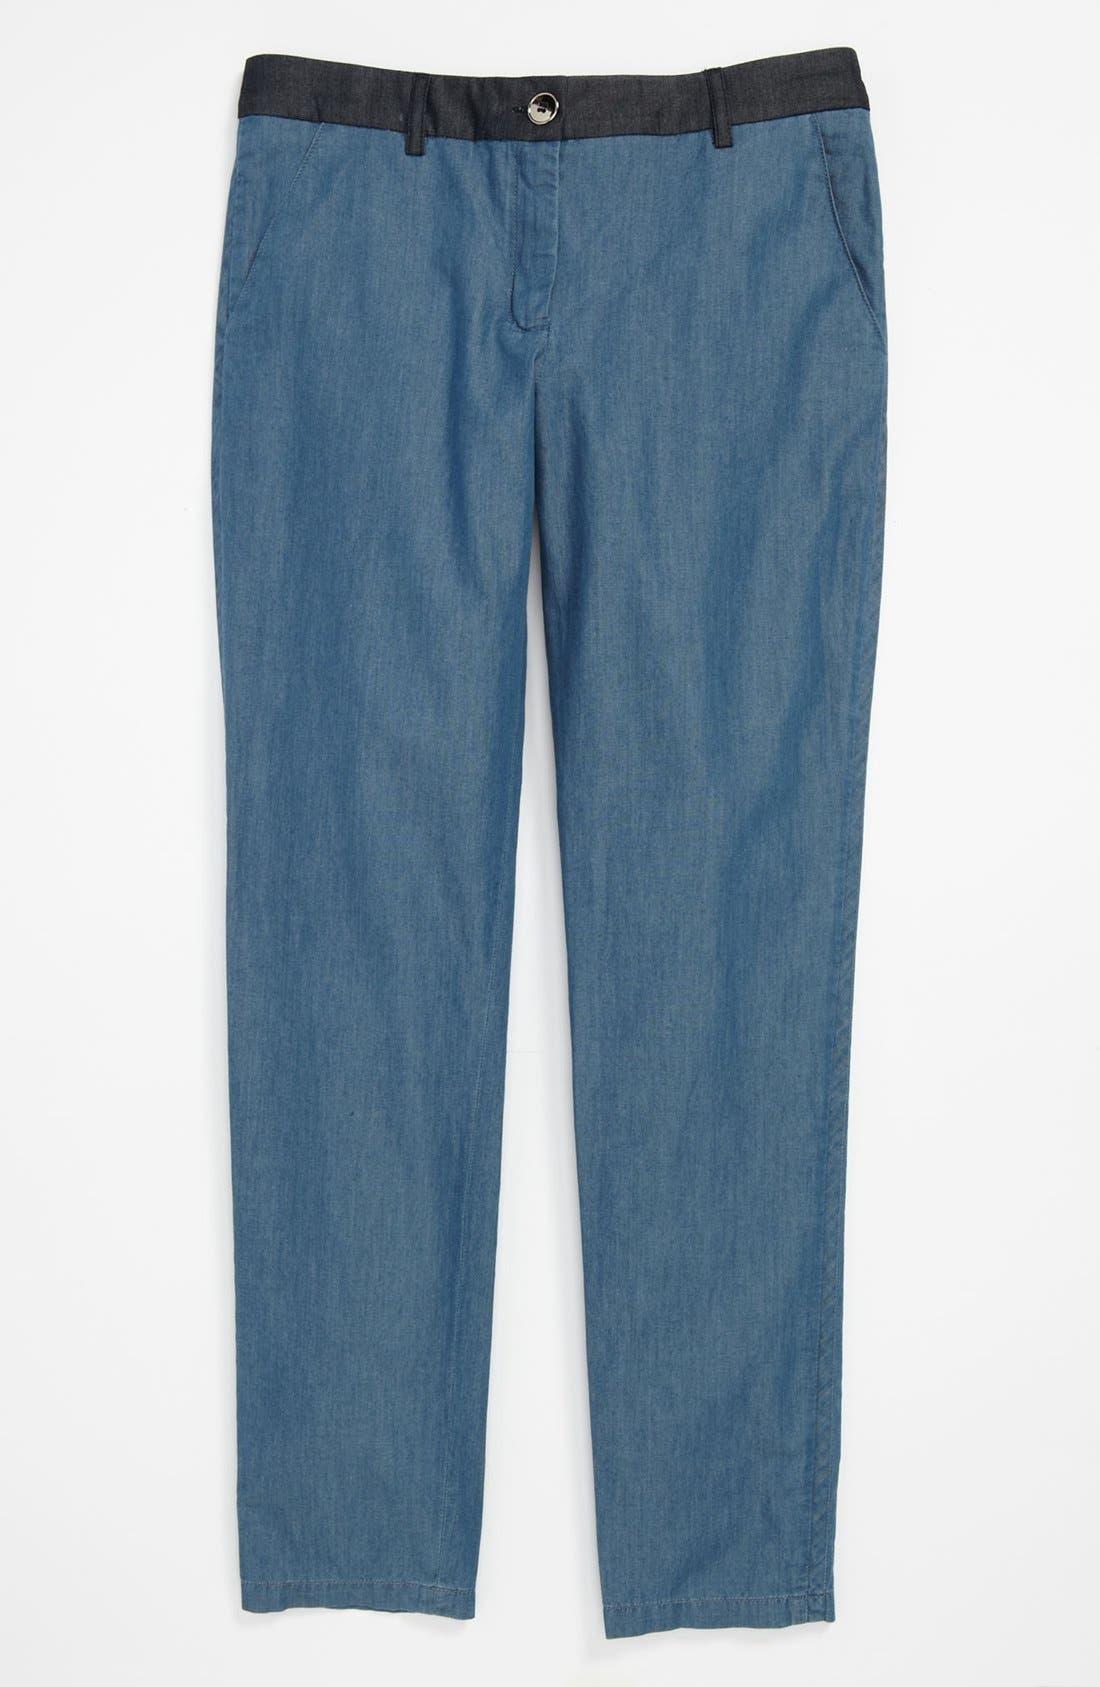 Alternate Image 2  - LITTLE MARC JACOBS Chambray Pants (Big Girls)